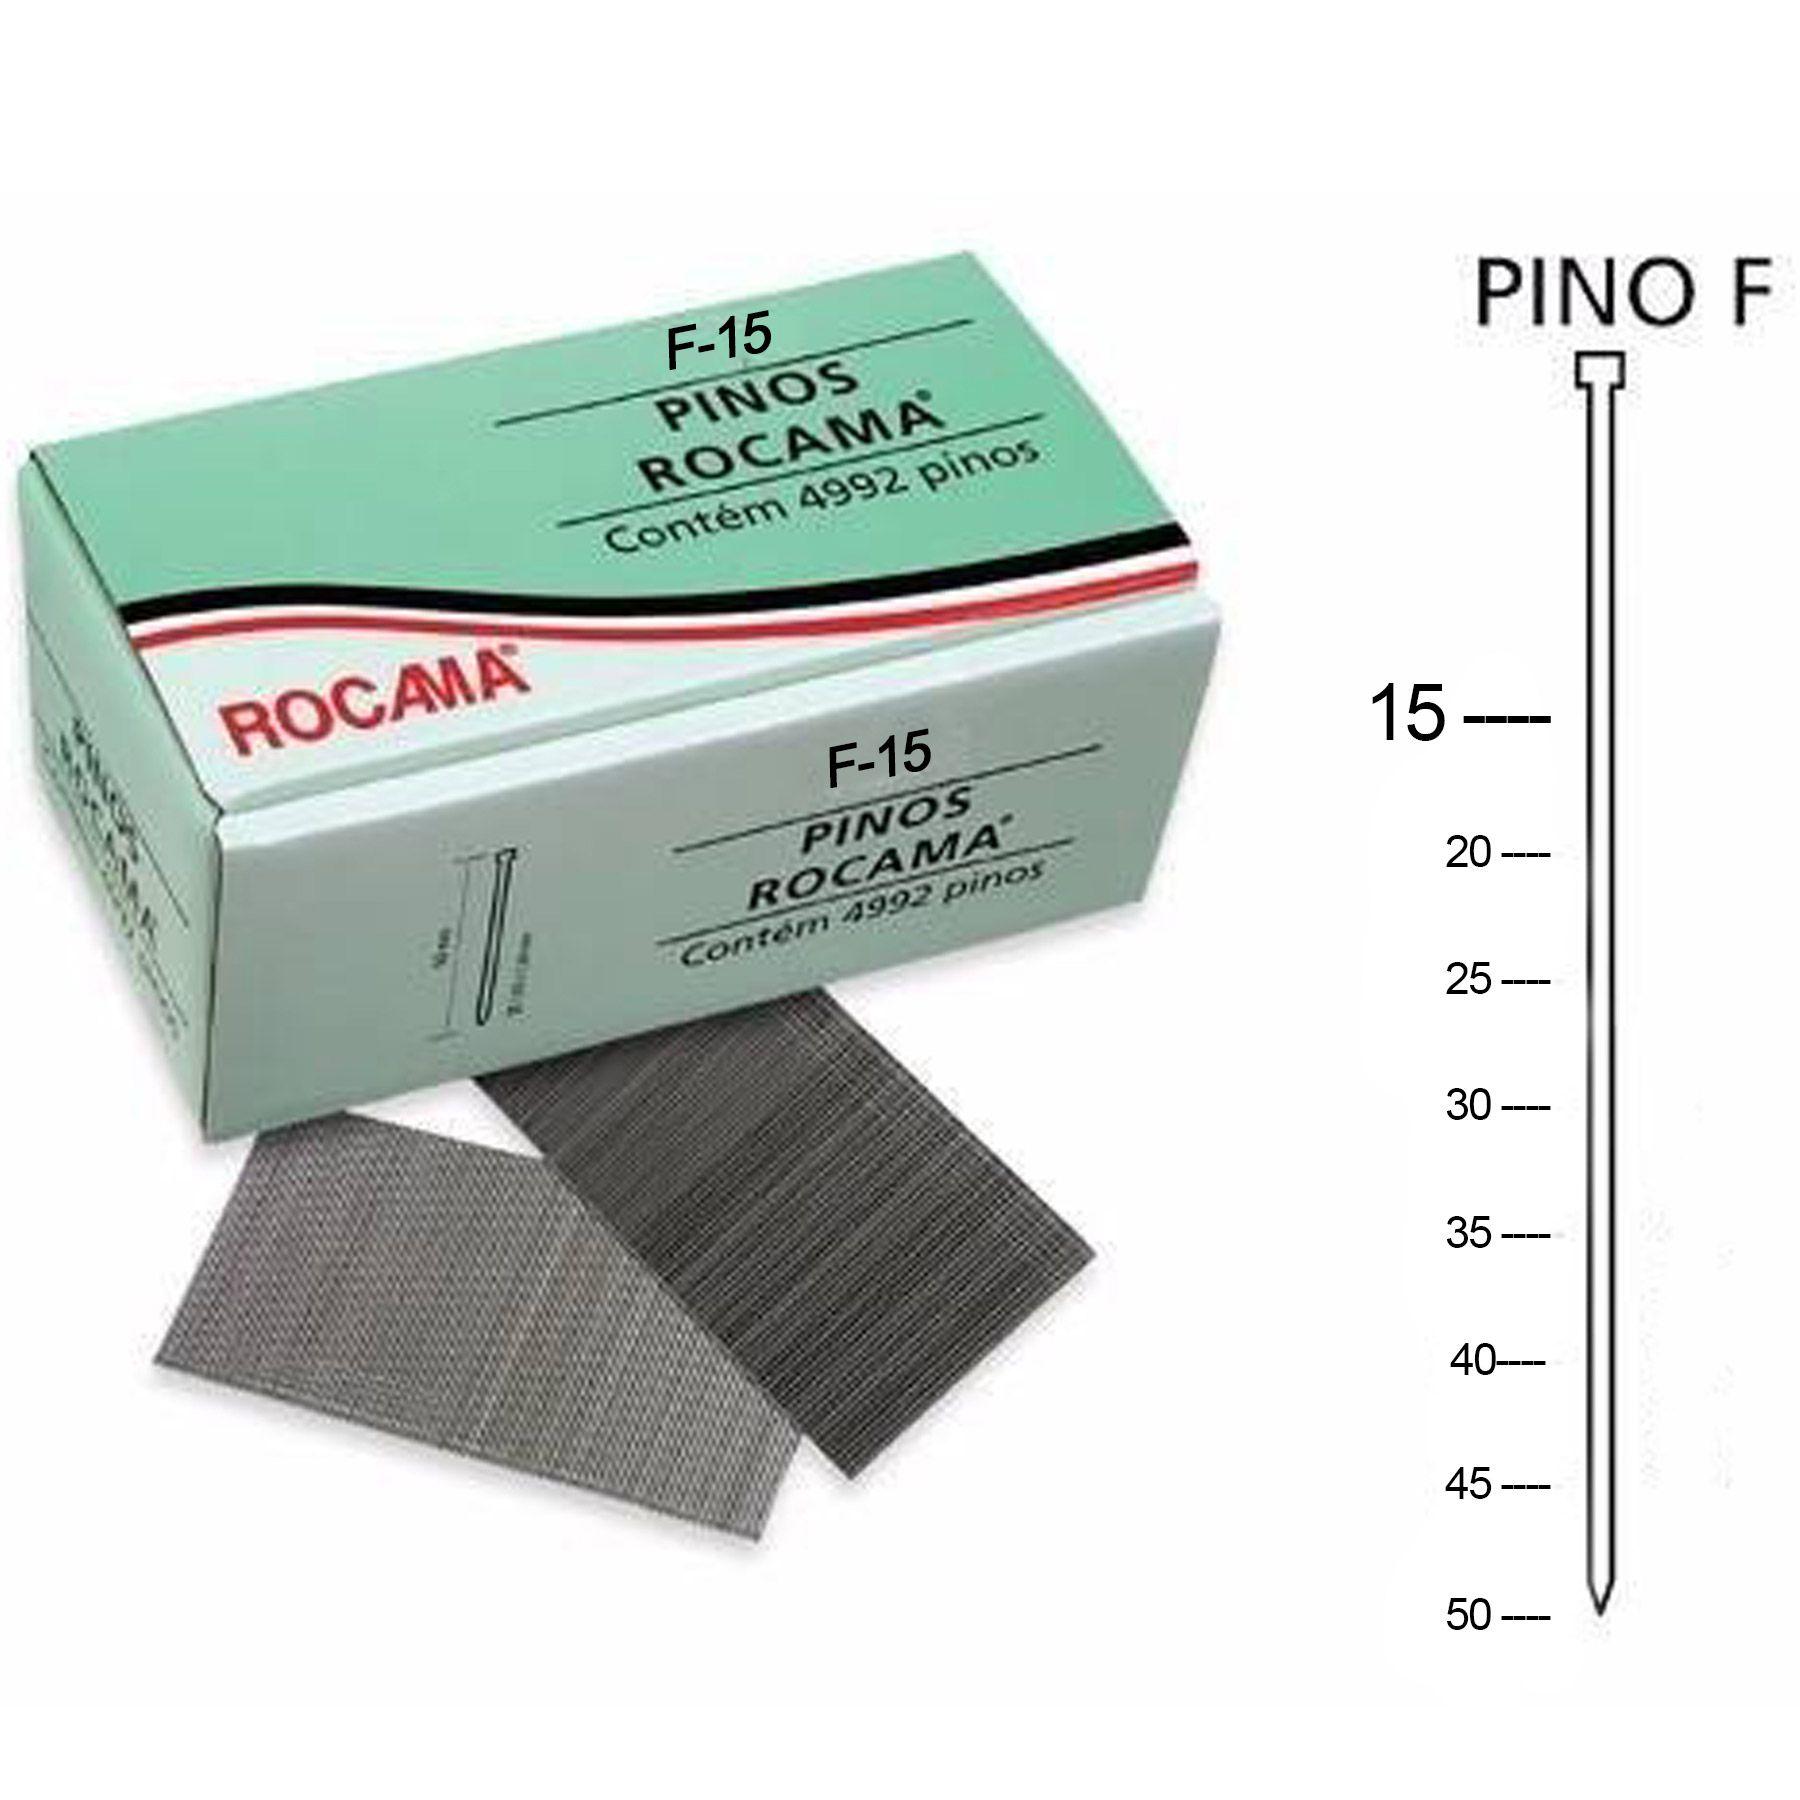 PINO F-15 P/ PINADOR PNM ROCAMA